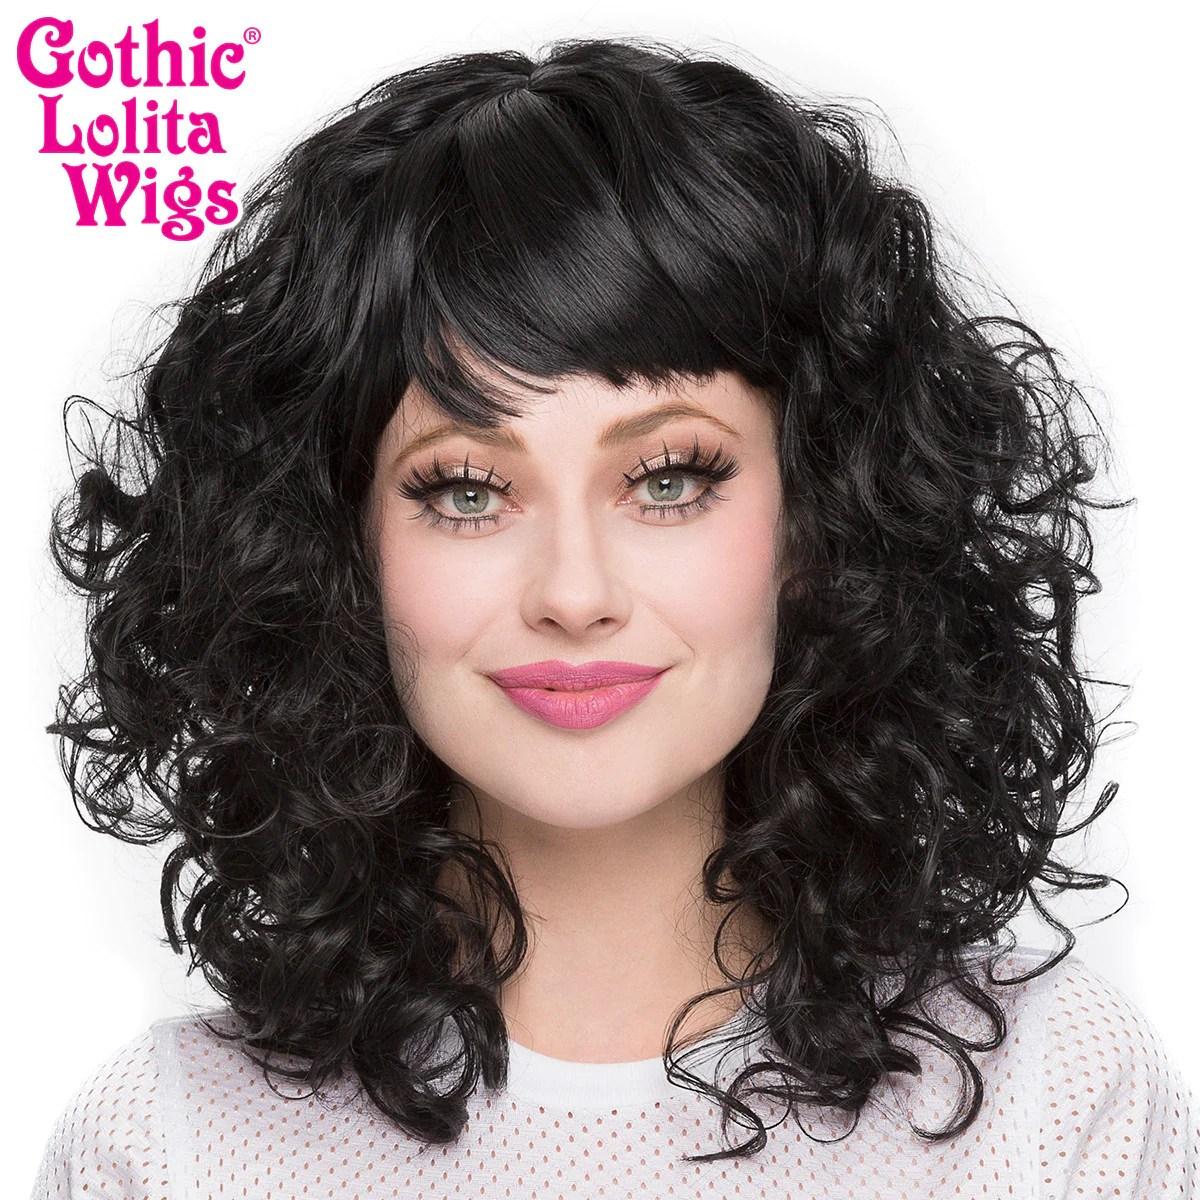 Gothic Lolita Wigs Bijou Black 00441 Dolluxe